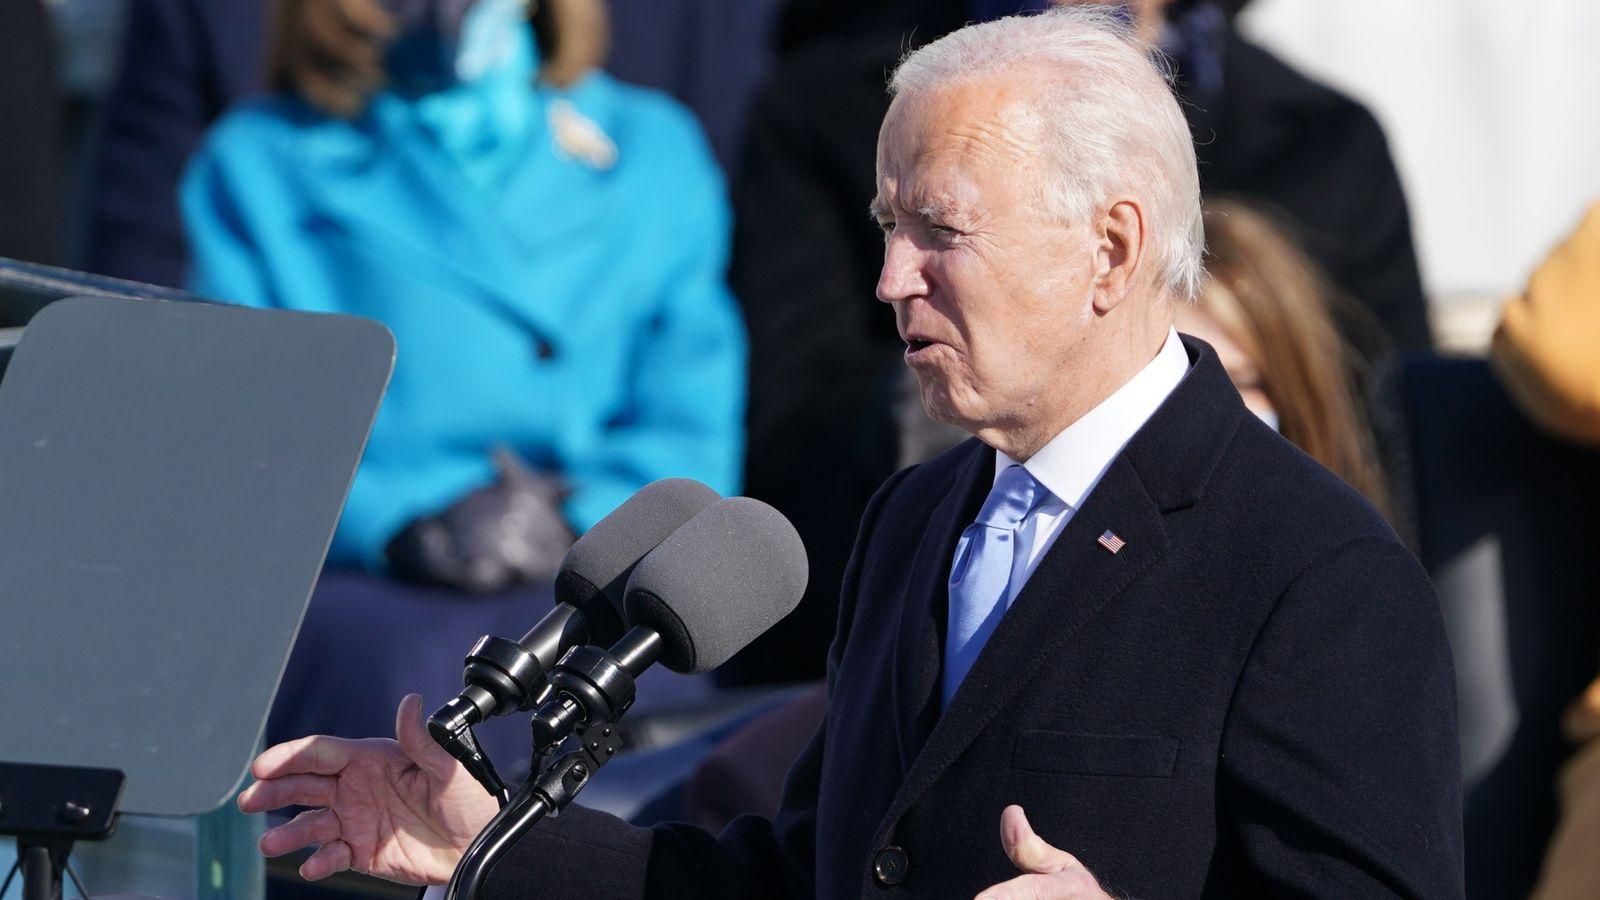 Biden inauguration news live: 'We must stop this uncivil war' - Joe Biden  addresses nation after being sworn in | US News | Sky News